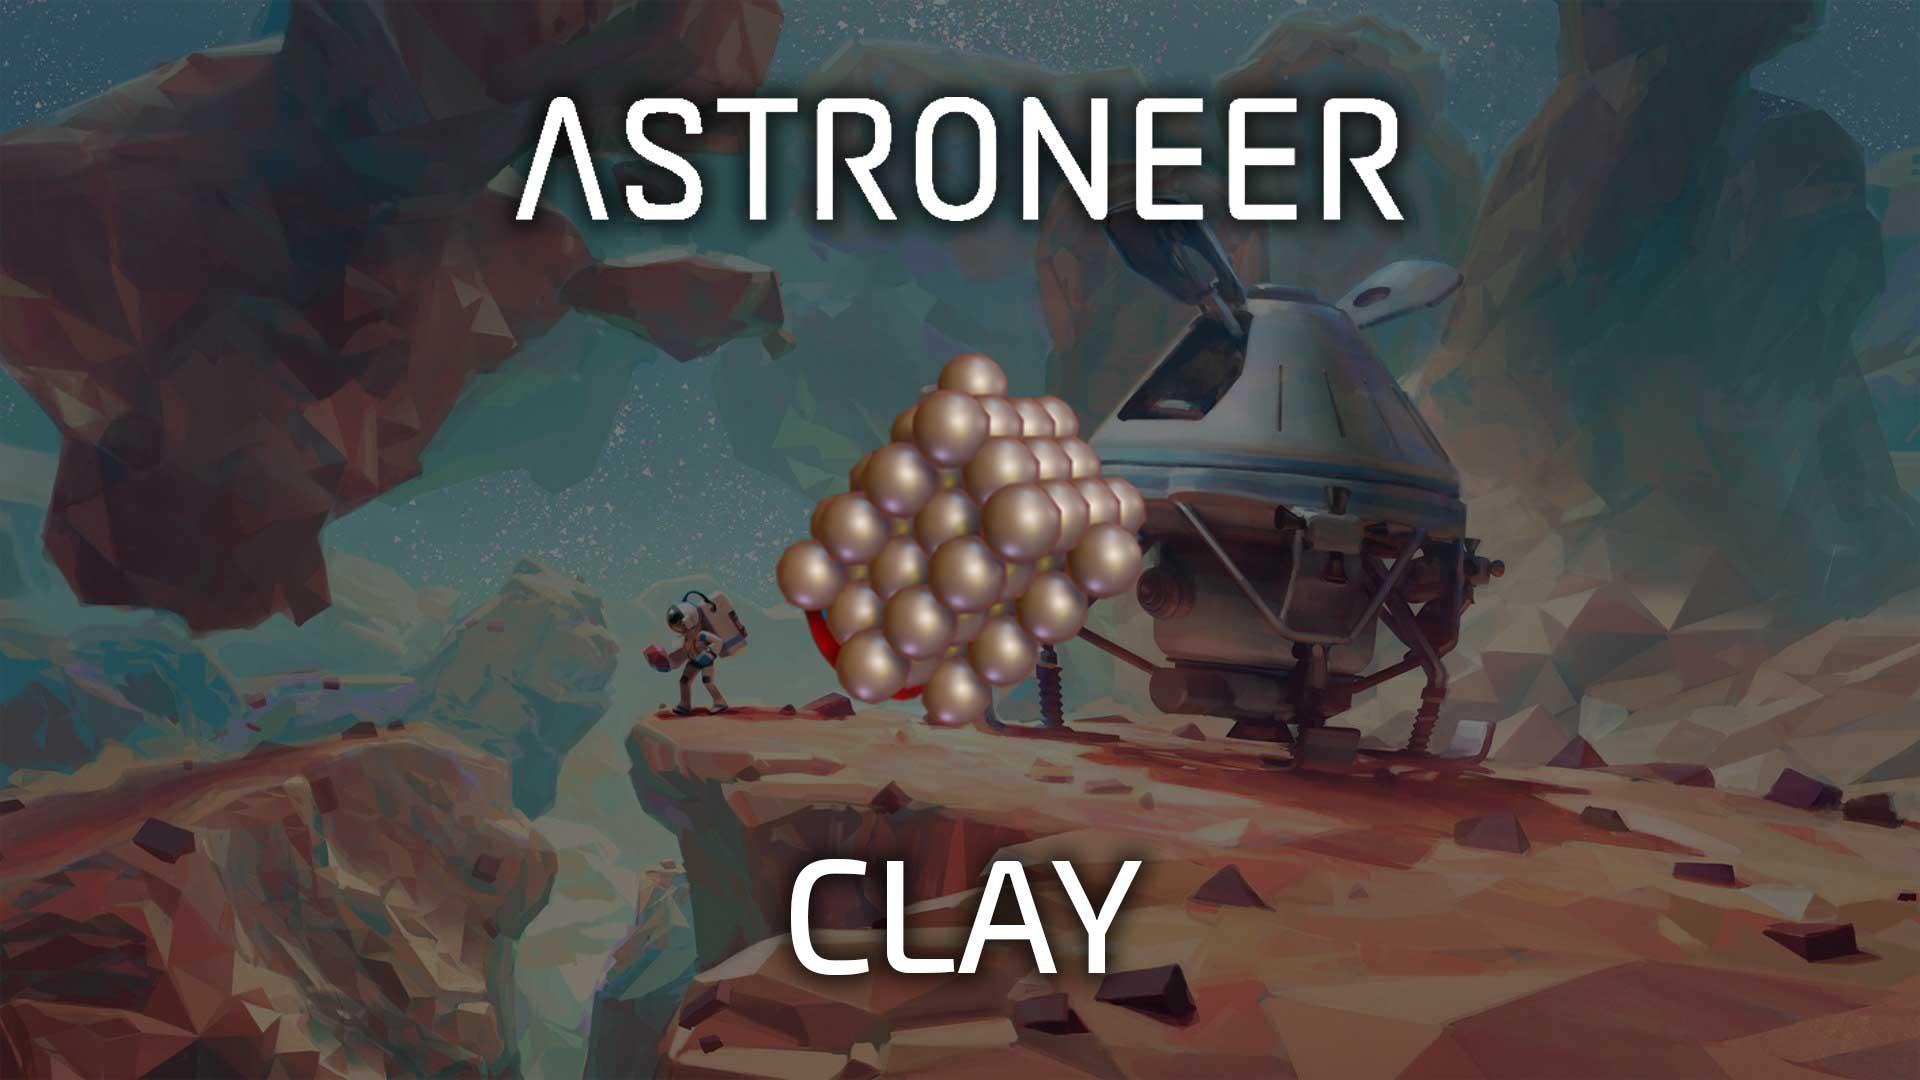 astroneer clay